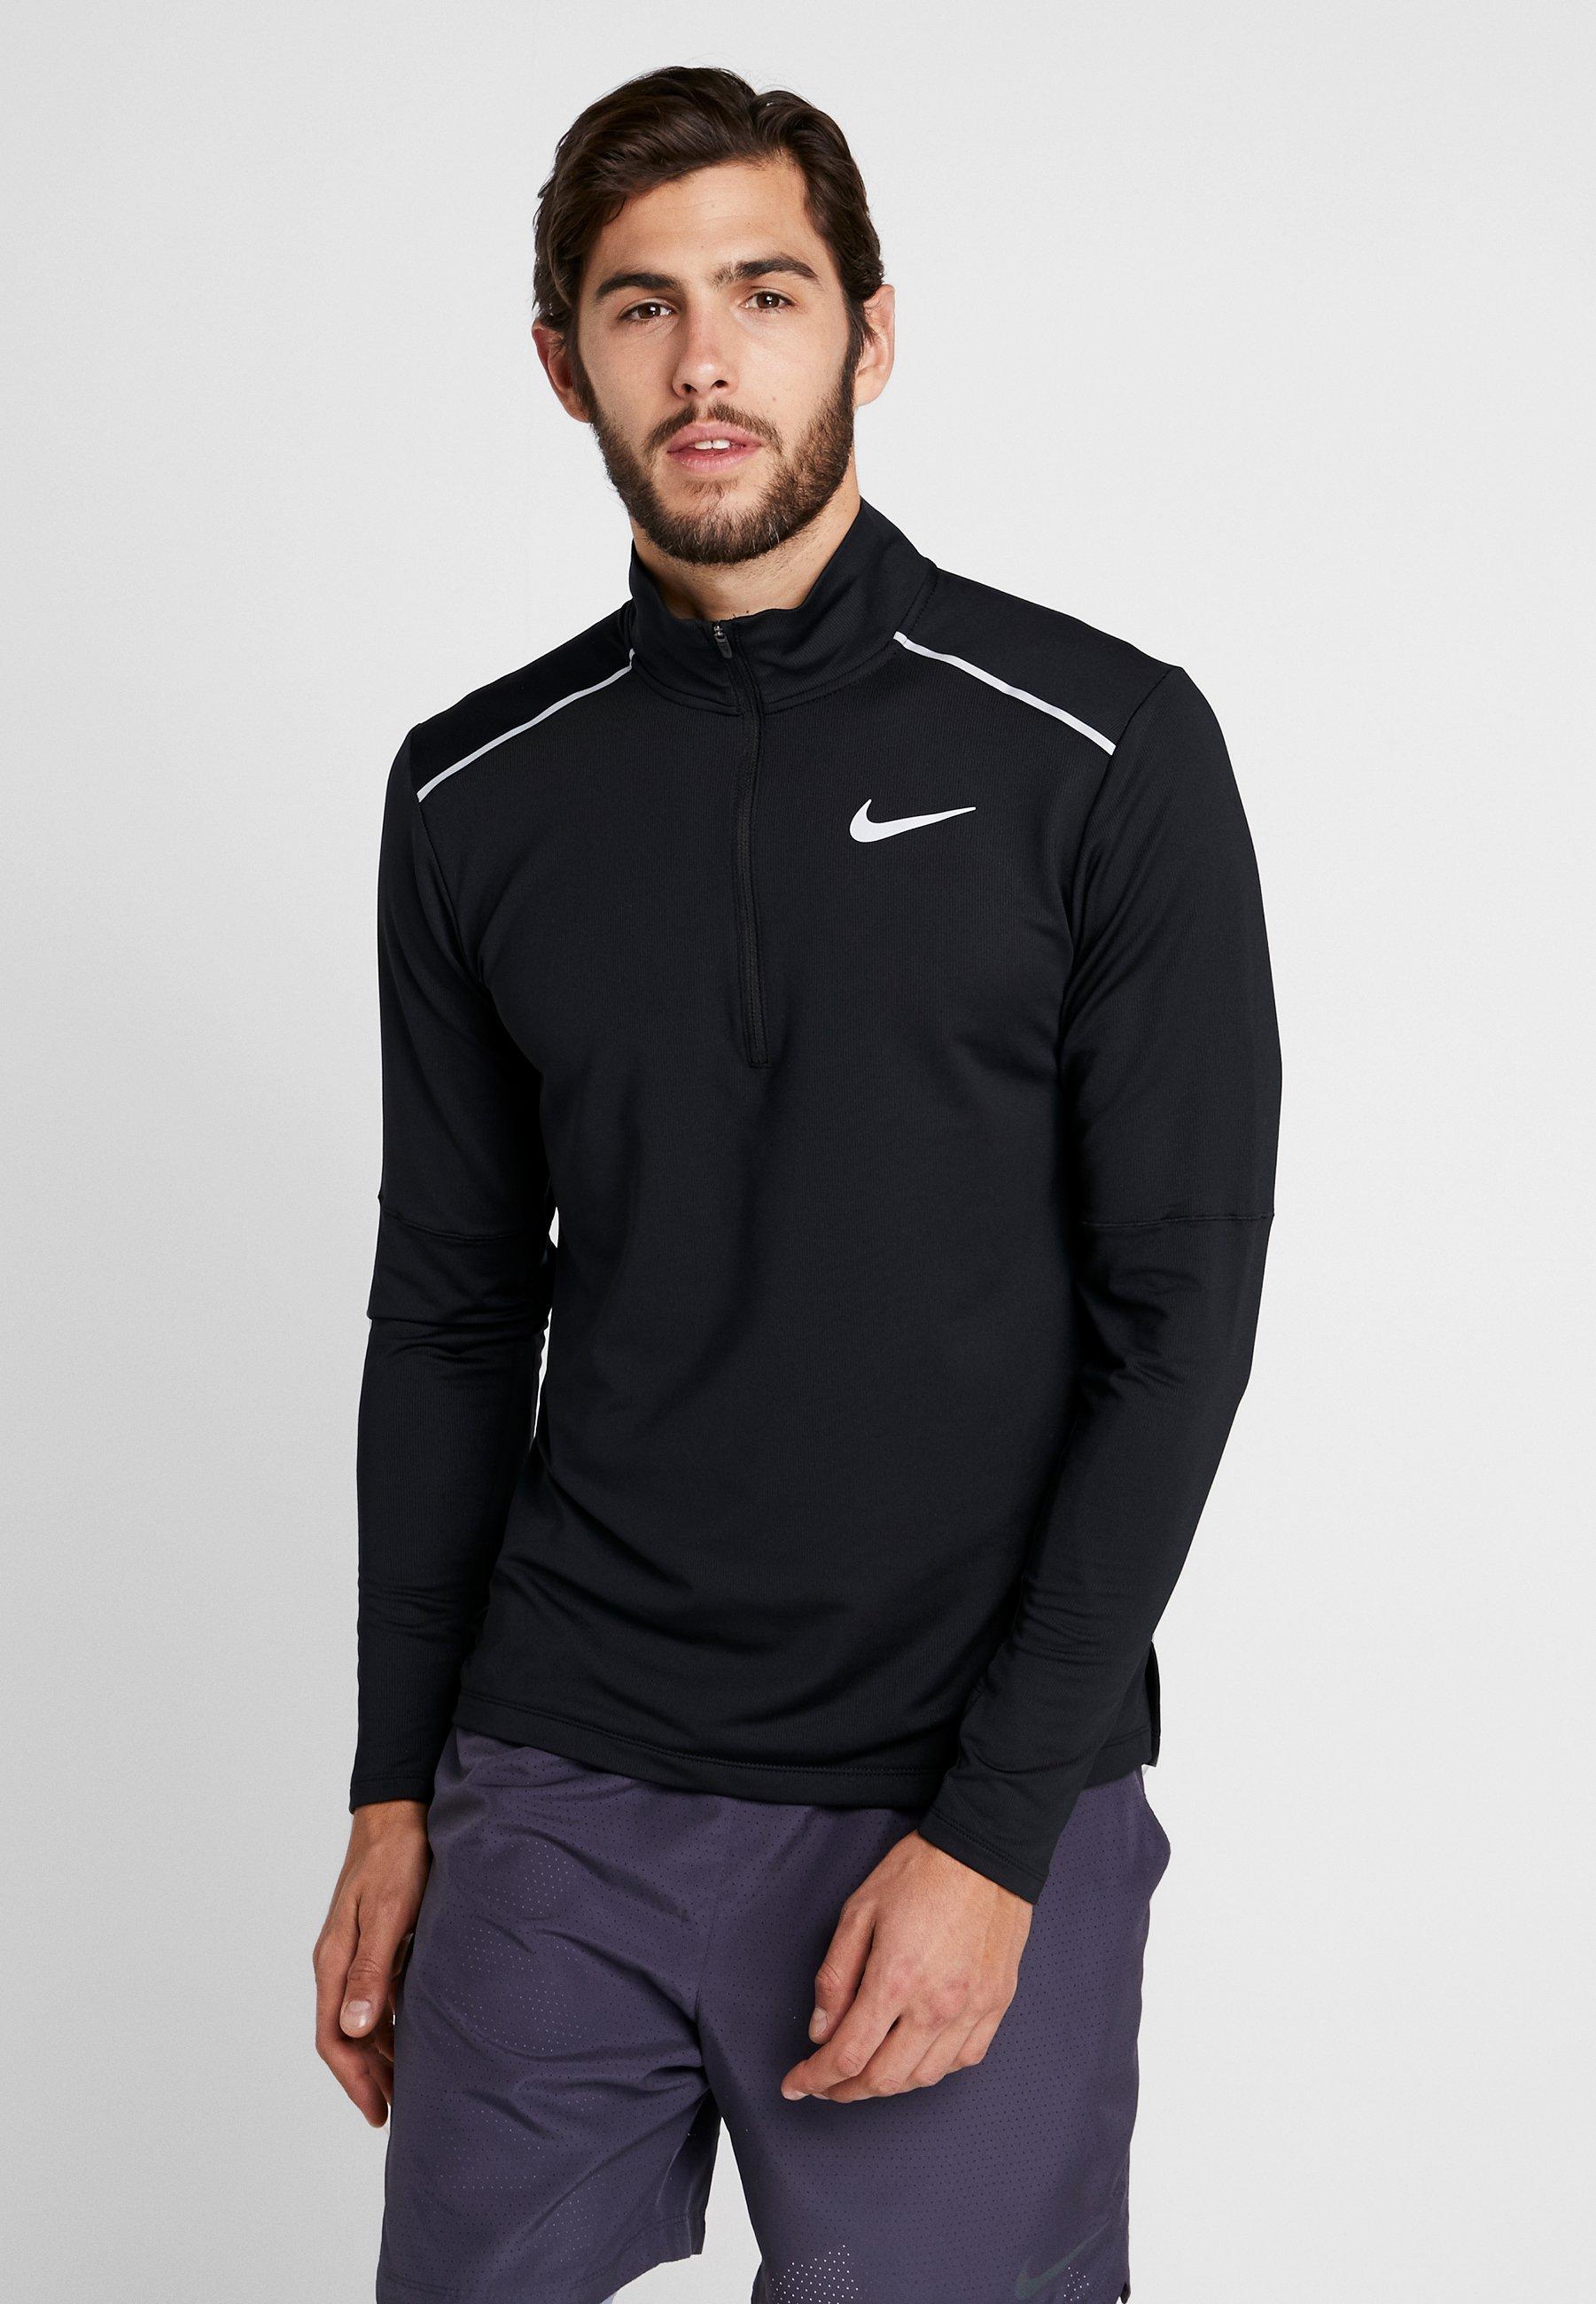 T shirt de sport blackreflective silver